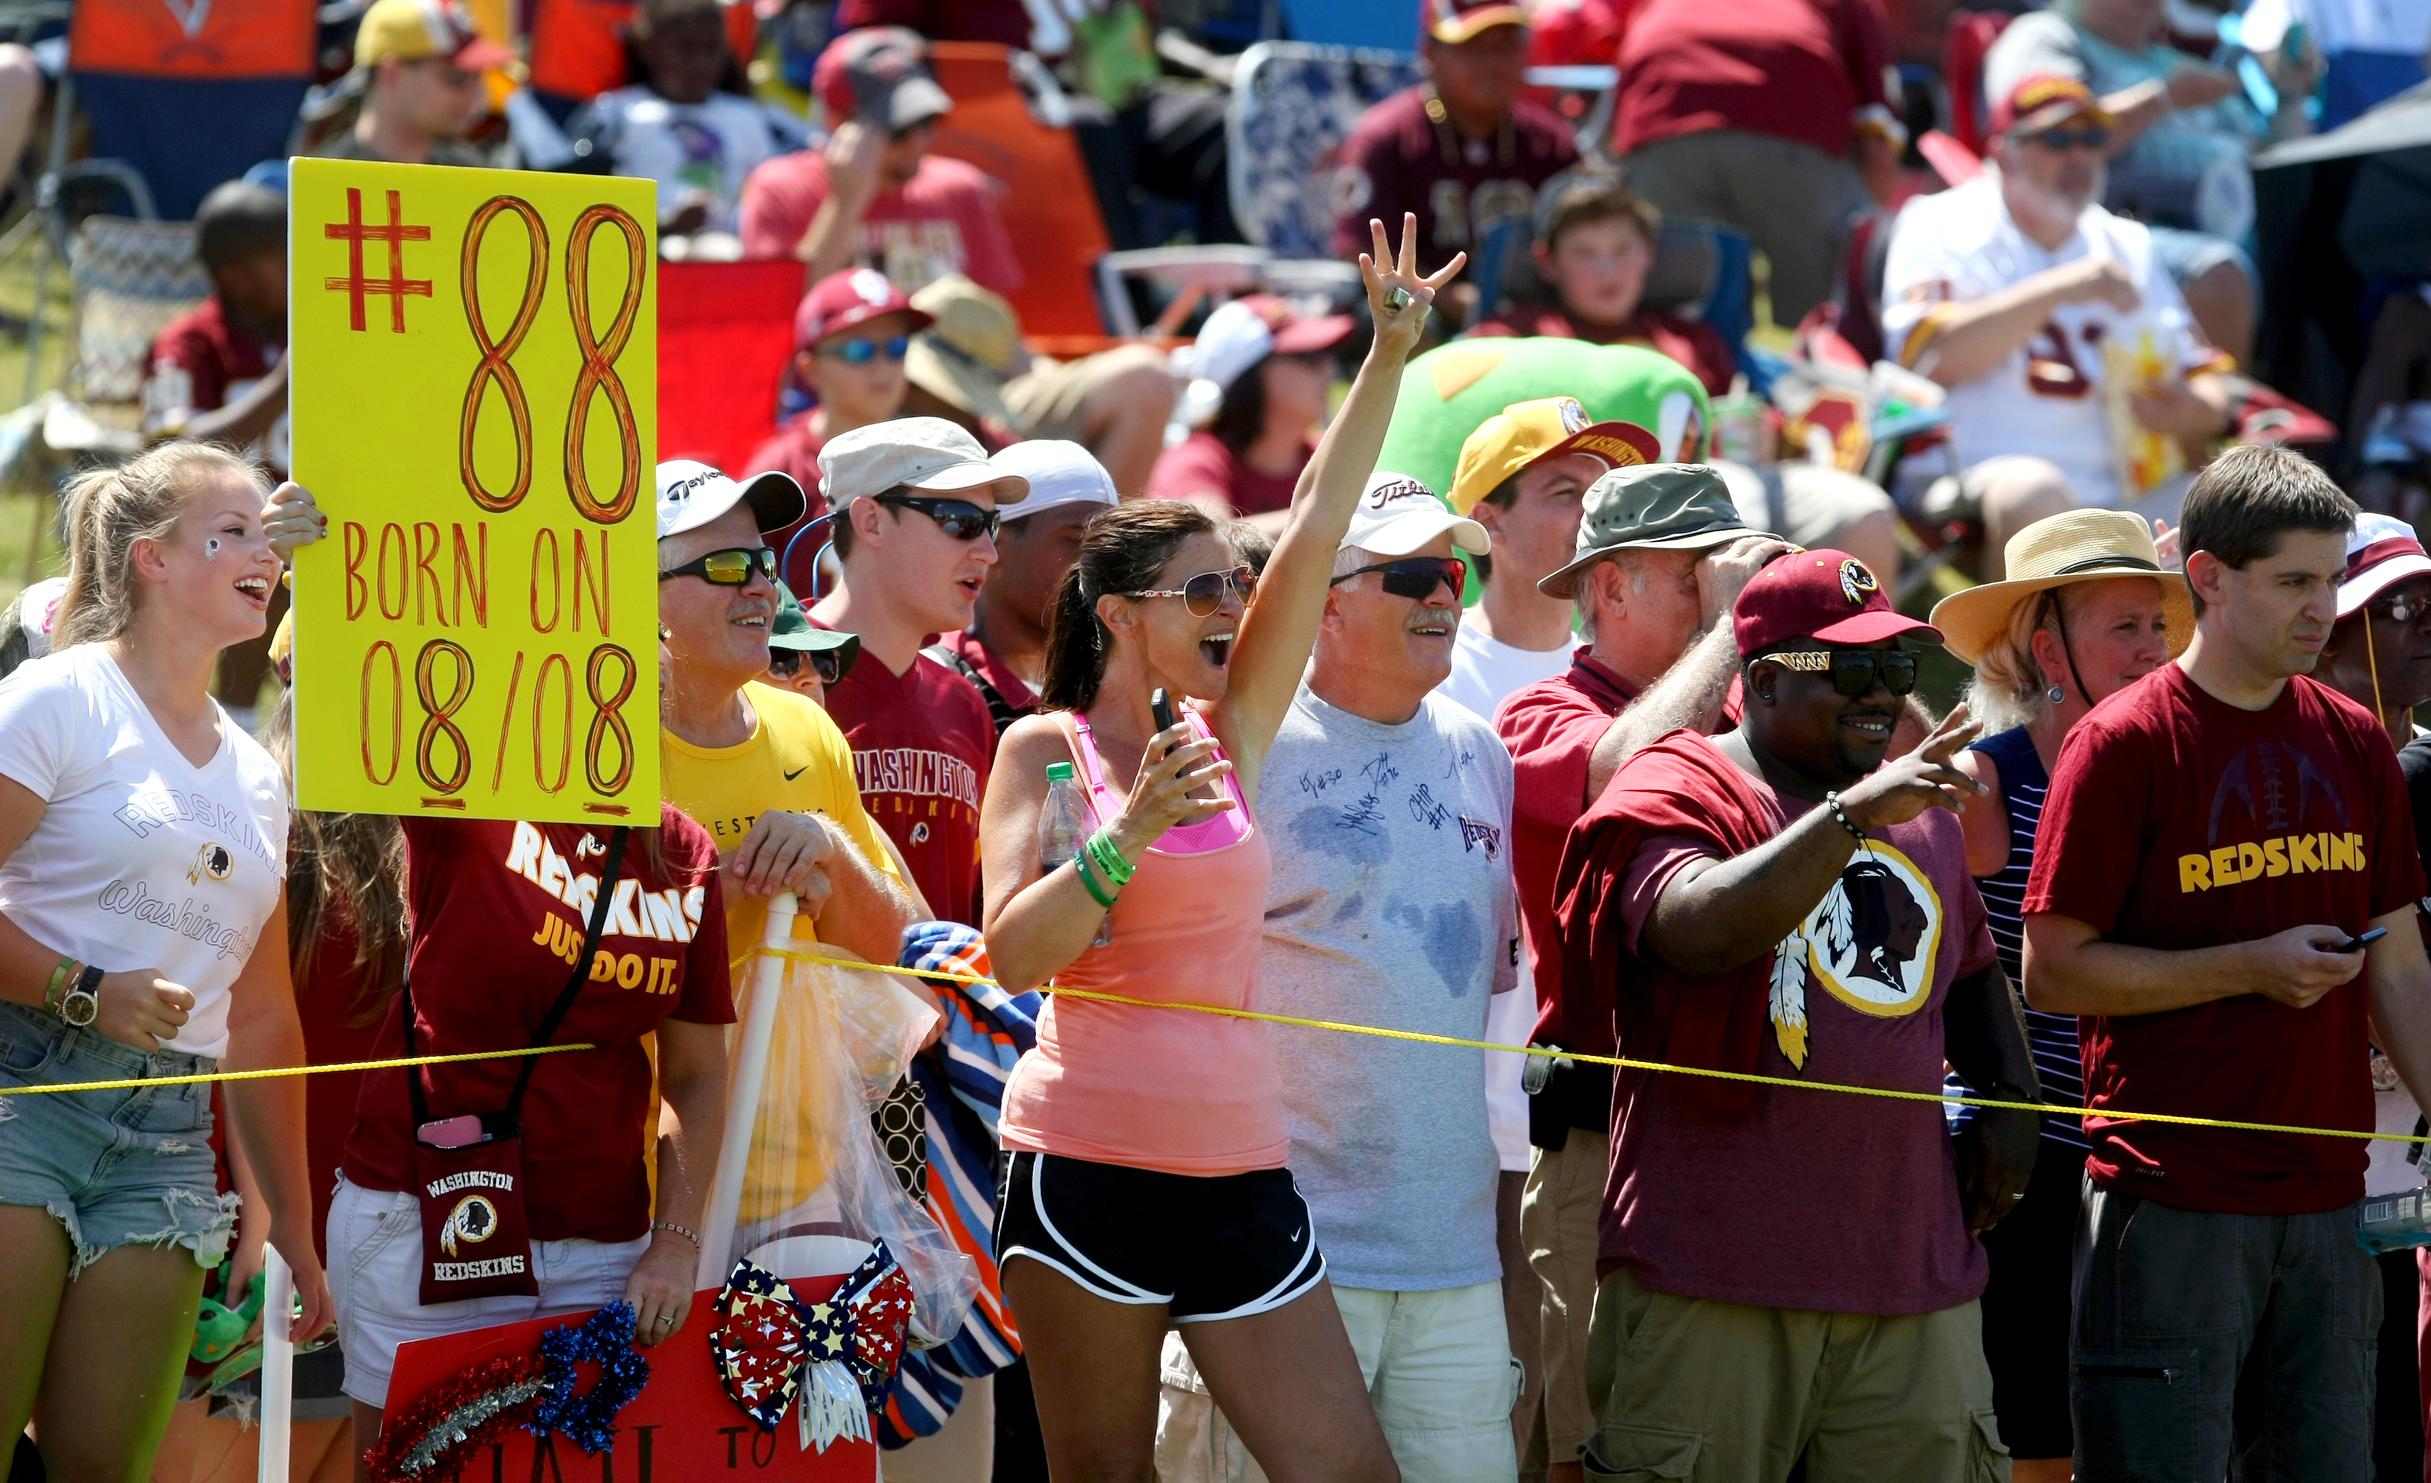 Washington Redskins fans line the sidelines during the team's NFL football training camp in Richmond, Va., Saturday, August 1, 2015. (AP Photo/Jason Hirschfeld)